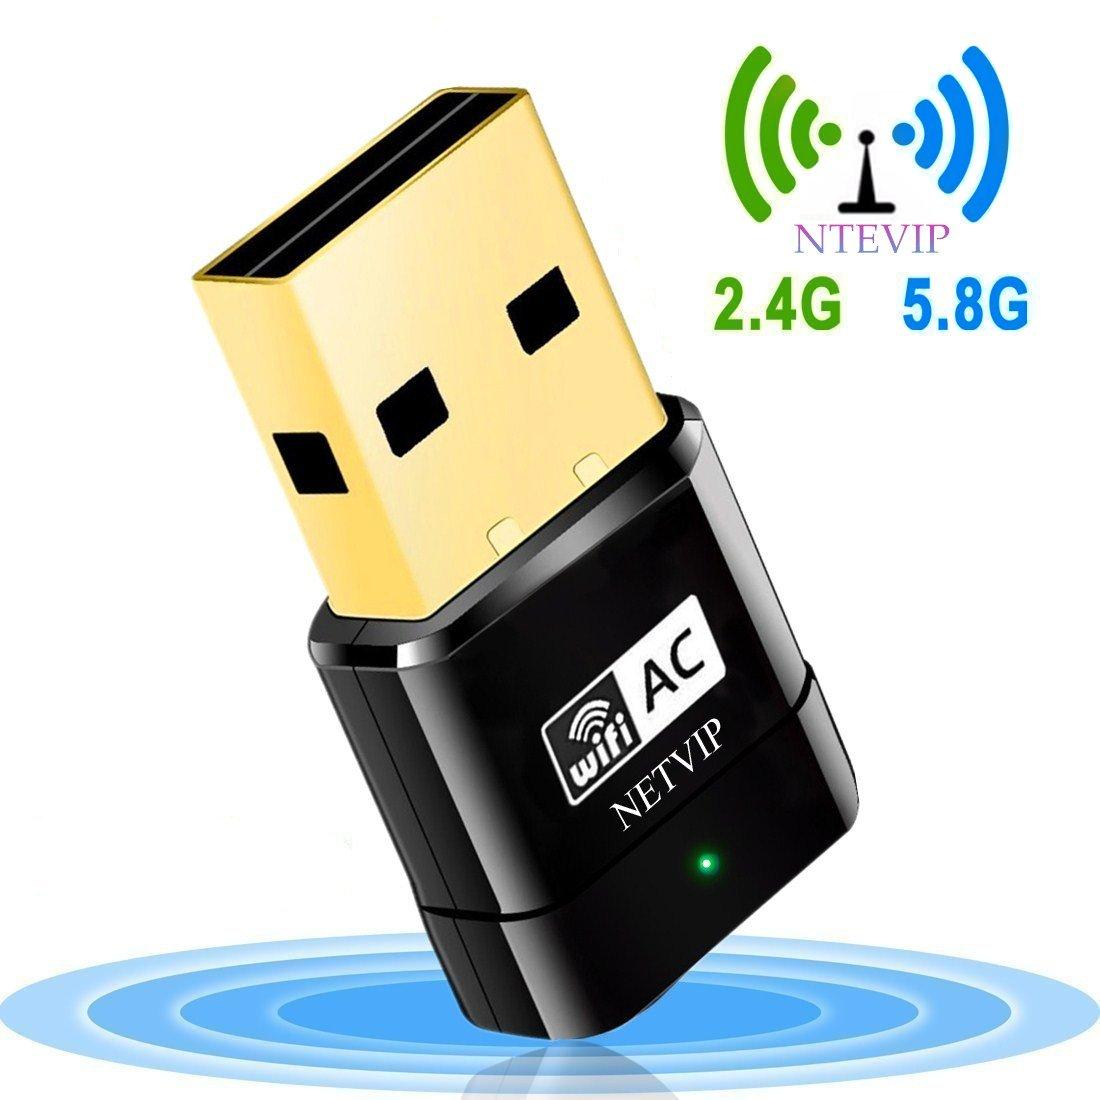 NETVIP Clé WiFi,AC600 WiFi USB Adaptateur,Hotspot Wireless Network Dual Band 5GHz/2.4GHz Mini AP WiFi Dongle Applique à Windows XP/Vista/7/8/10(32/64 Bits)/Mac OS X product image